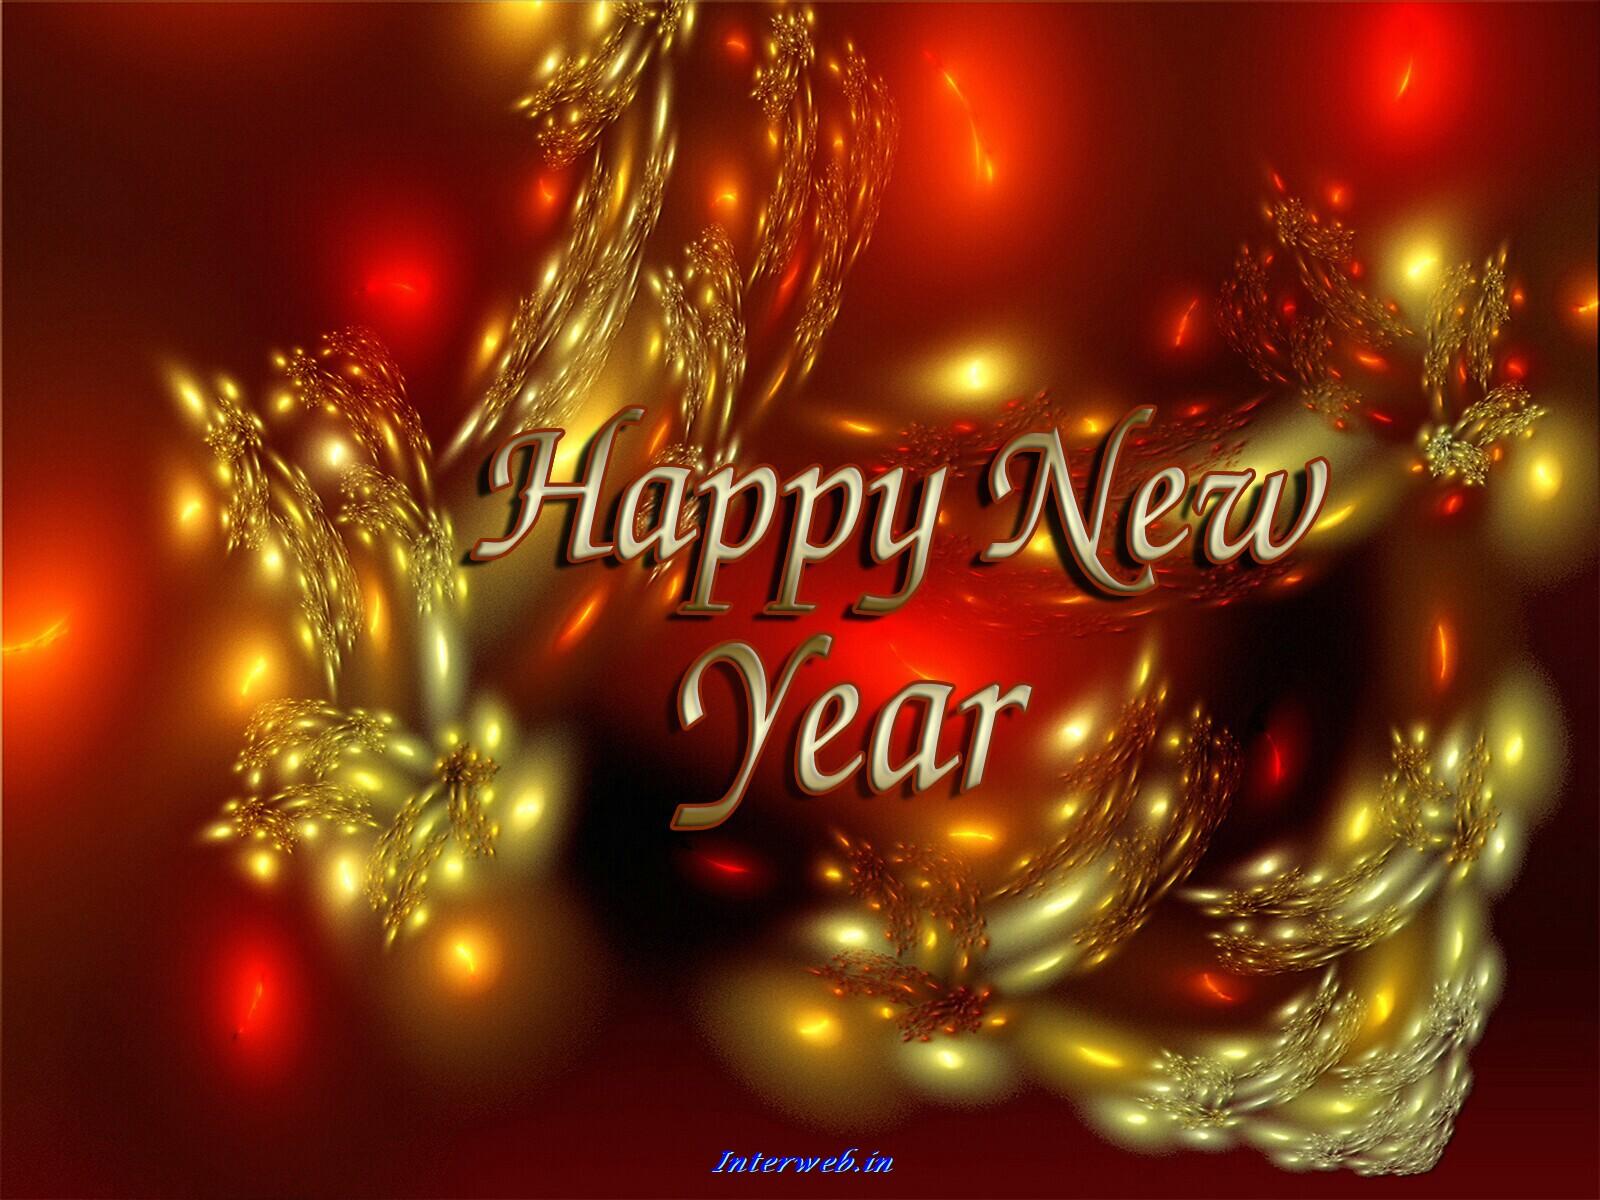 http://3.bp.blogspot.com/-e6JHhmS9bHc/Tl868wXlFoI/AAAAAAAAD3U/Br9nJBwZe90/s1600/New+Year+2011+-+14.jpg